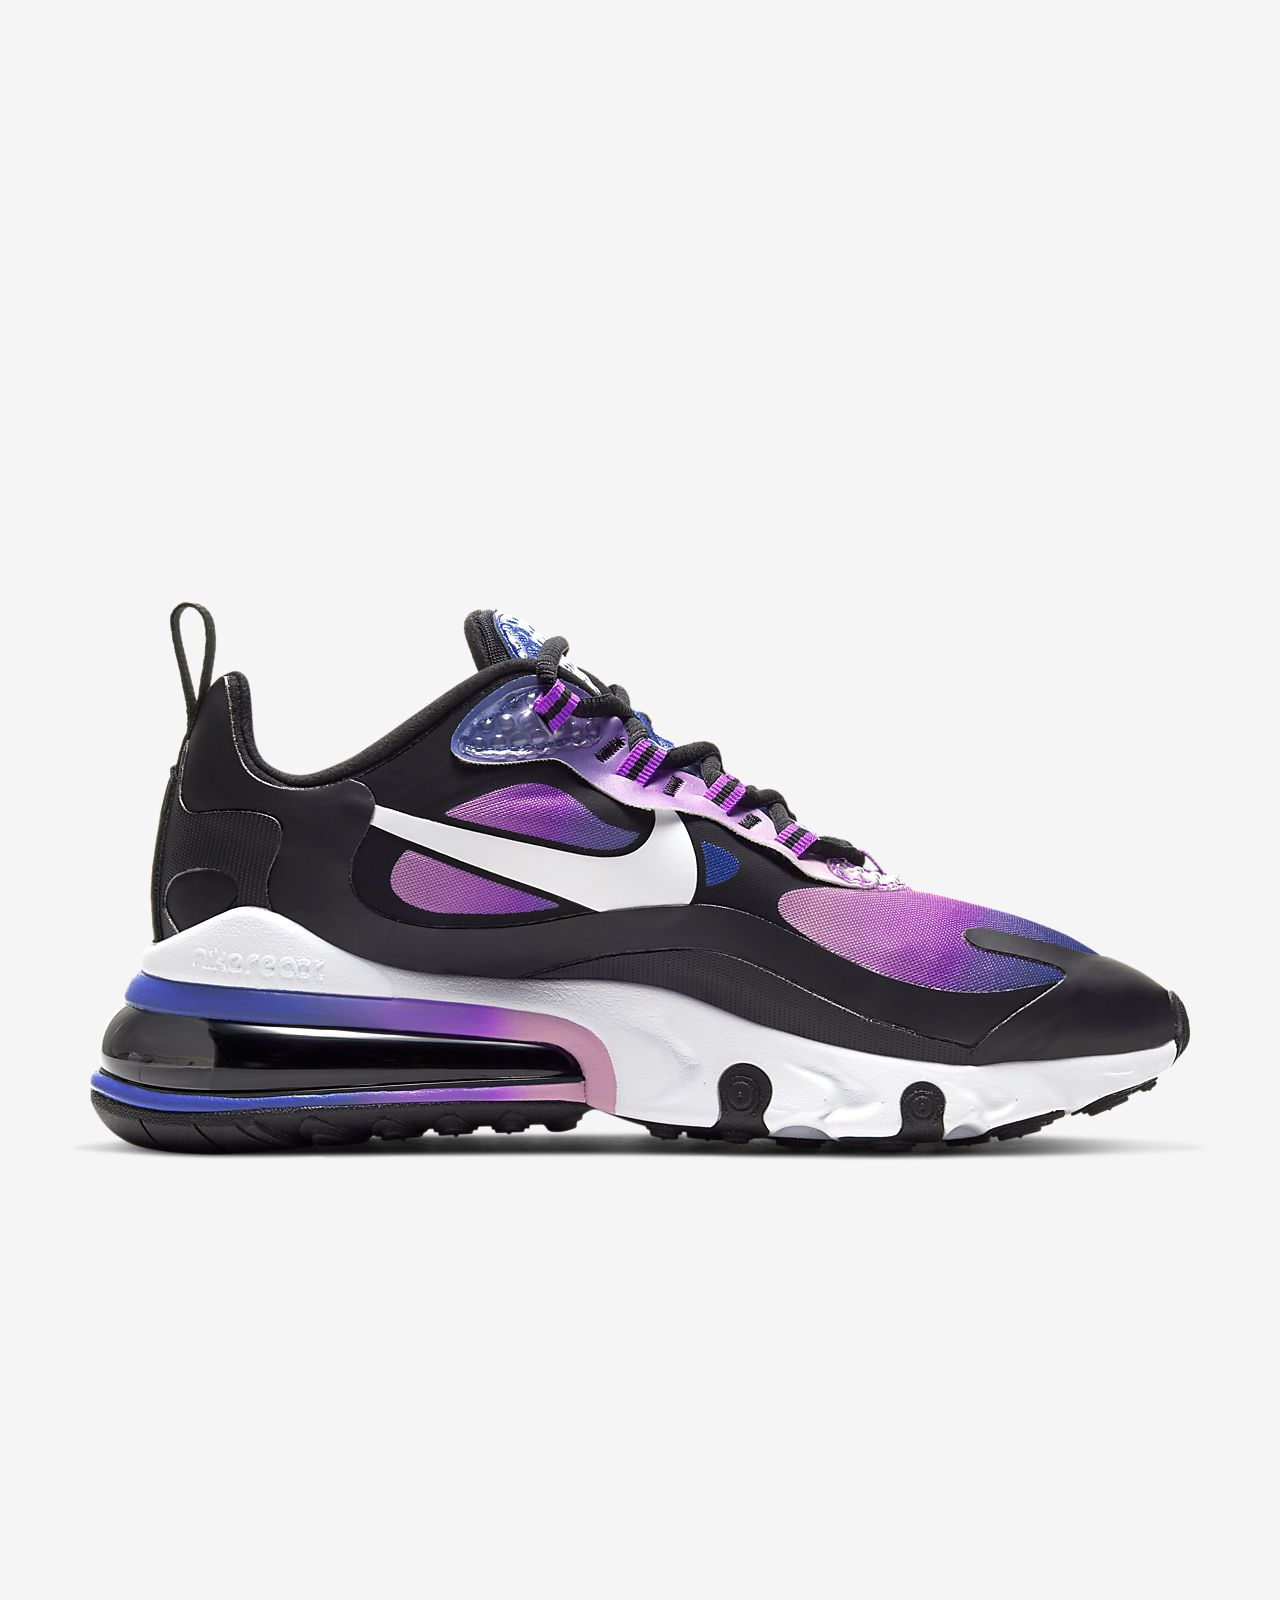 nike air max 270 black and purple